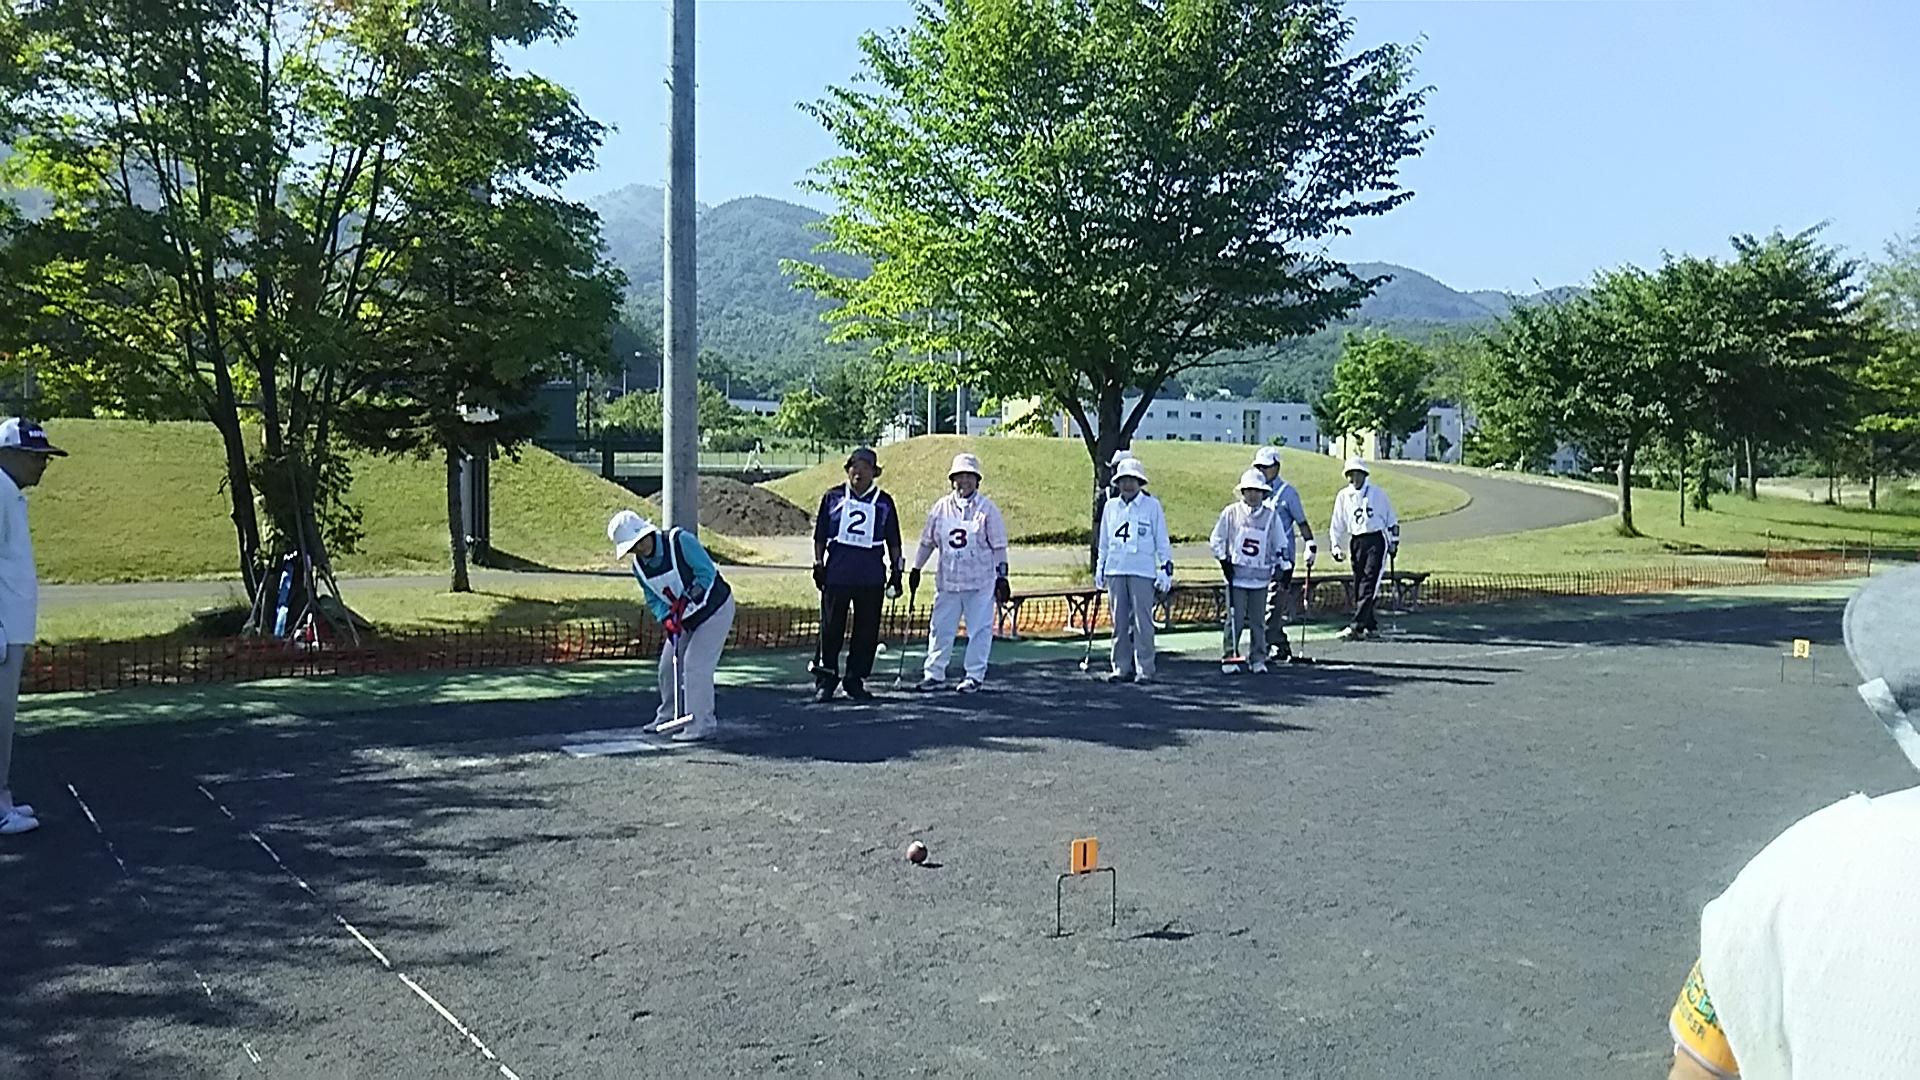 第16回蘭越町営温泉湯の旅ゲートボール大会成績